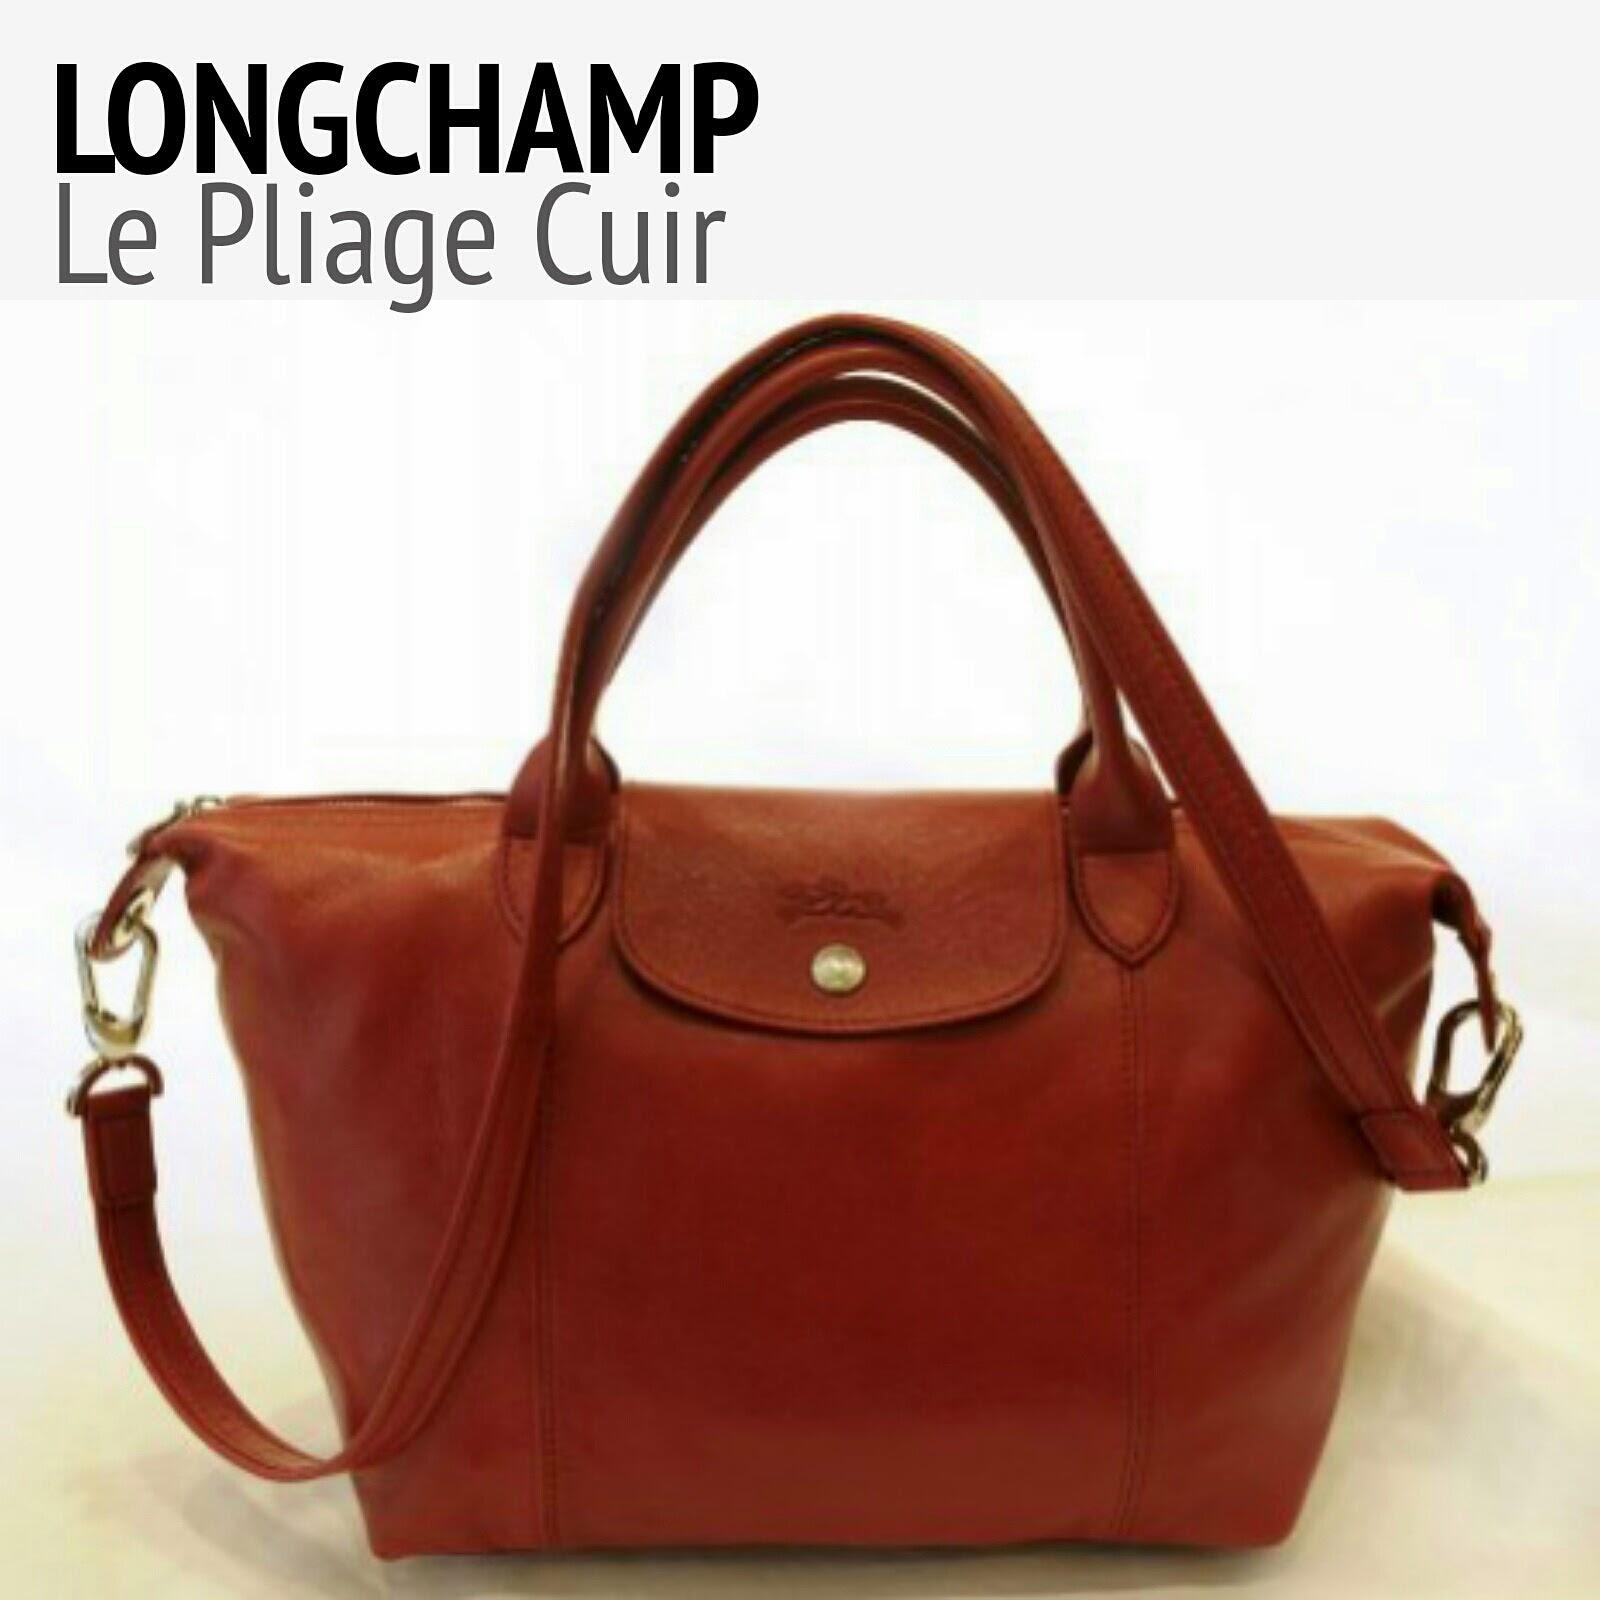 longchamp brown tote longchamp pliage medium longchamp nylon tote sale 818e407d0e3a3